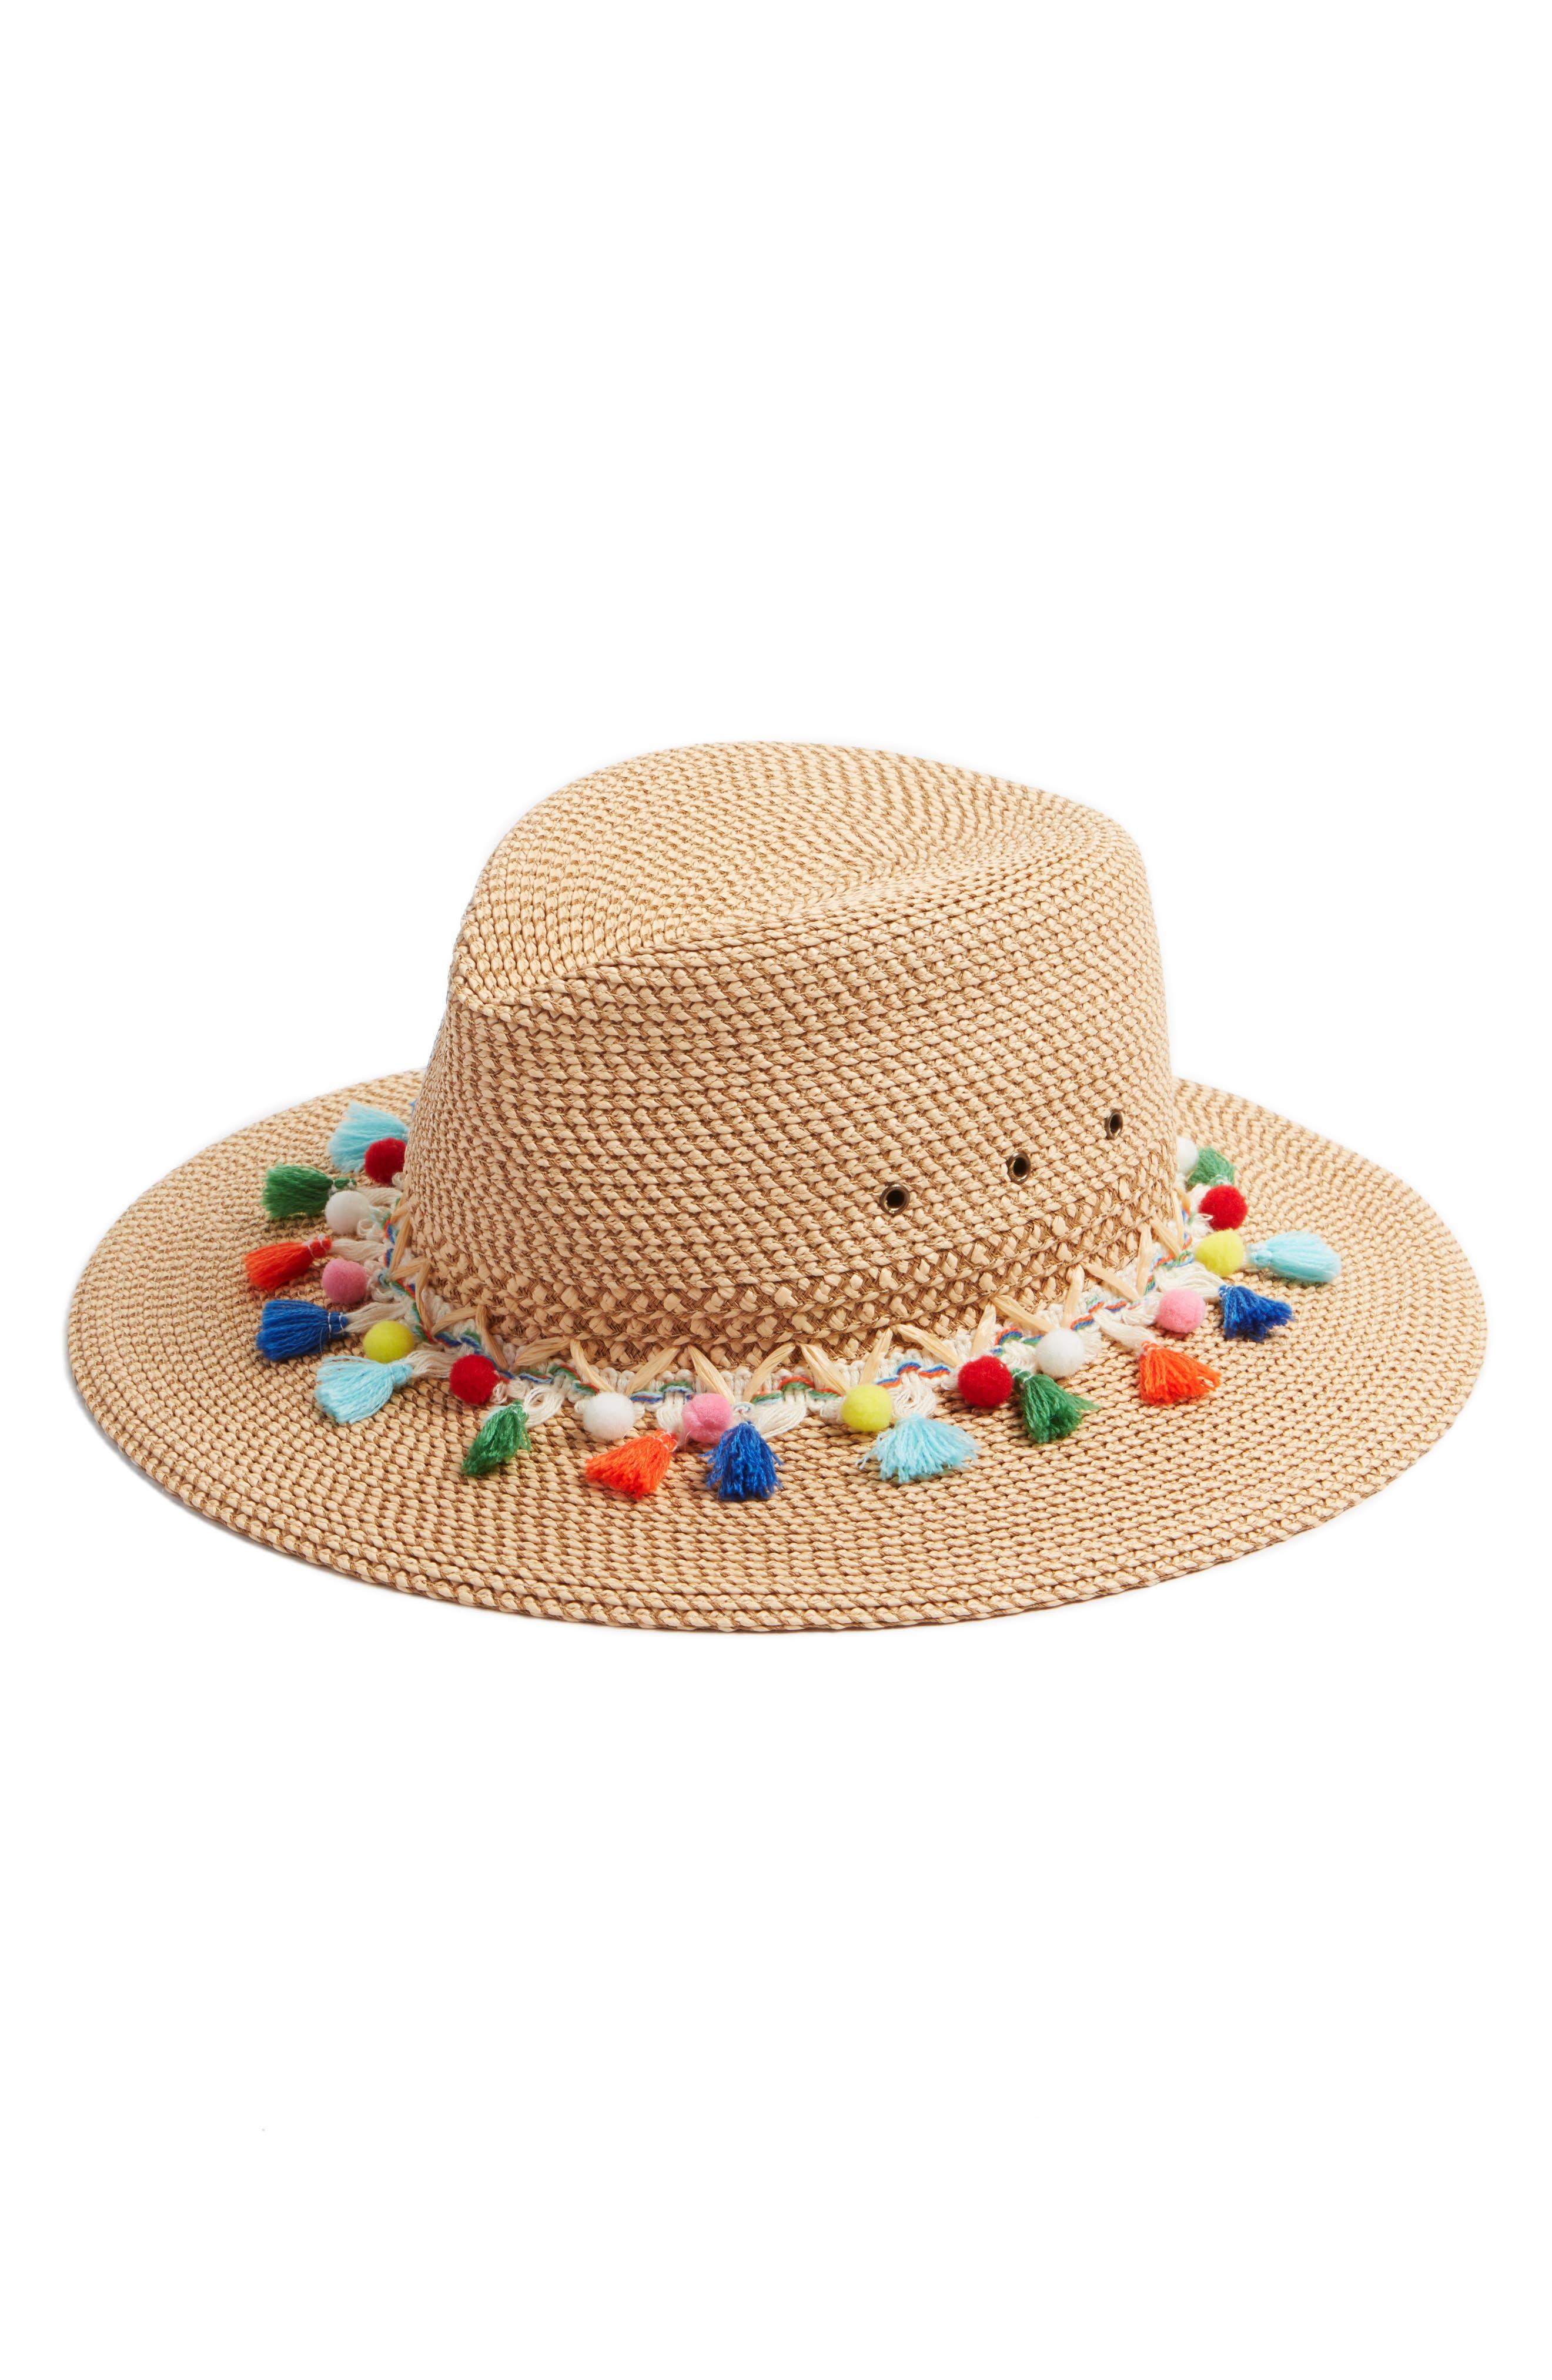 Bahia Sun Hat,                         Main,                         color, 250